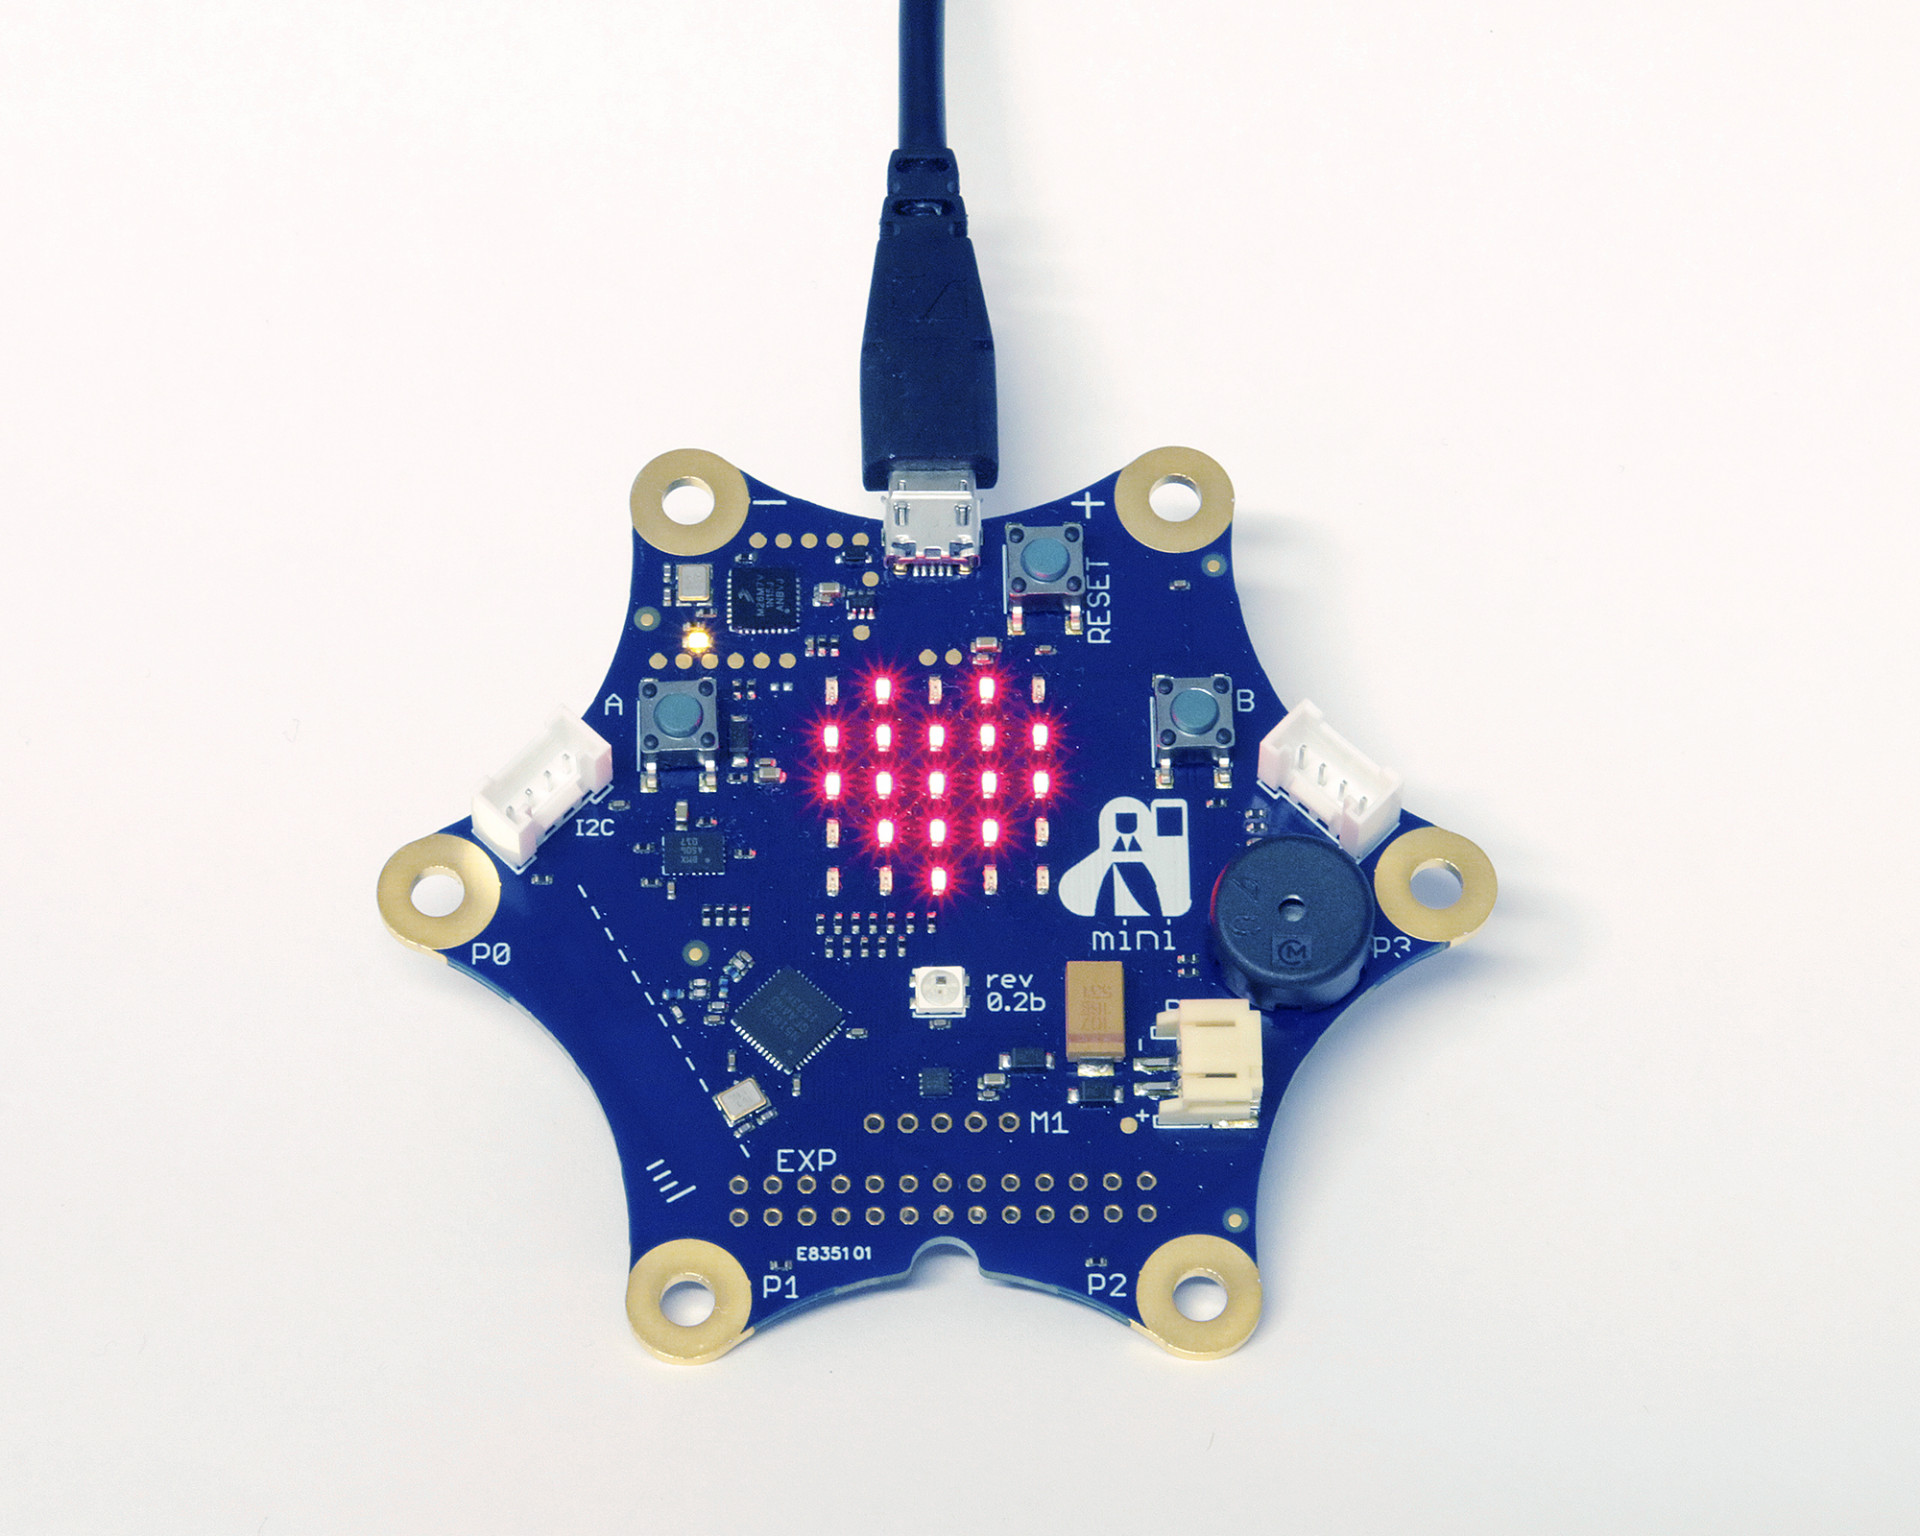 Lern Mikrocontroller Calliope mini startet Crowdfunding